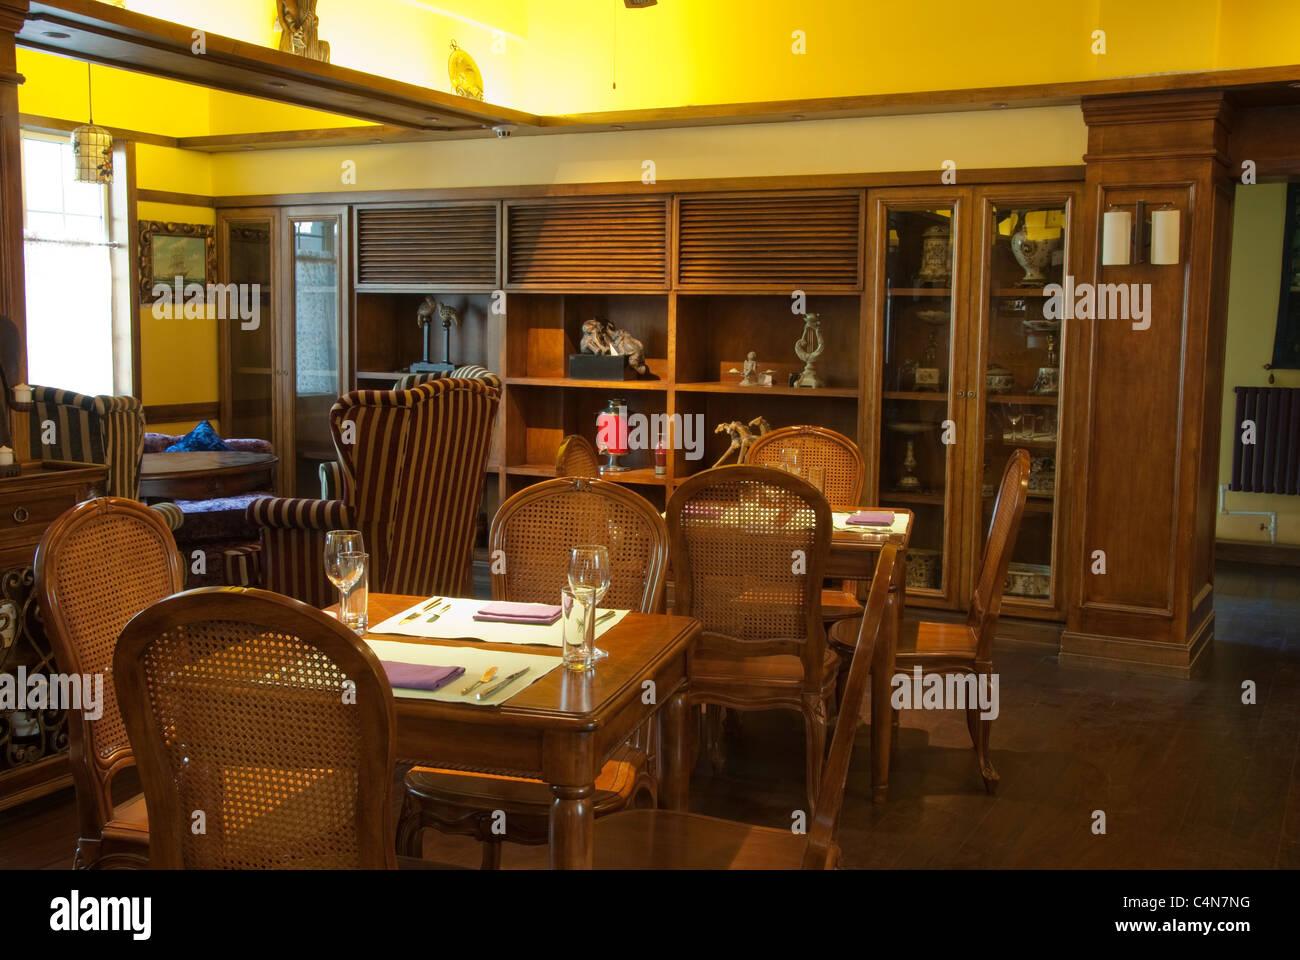 Beijing, China, Asian Restaurant Tabel inside Dining Room Stock Photo